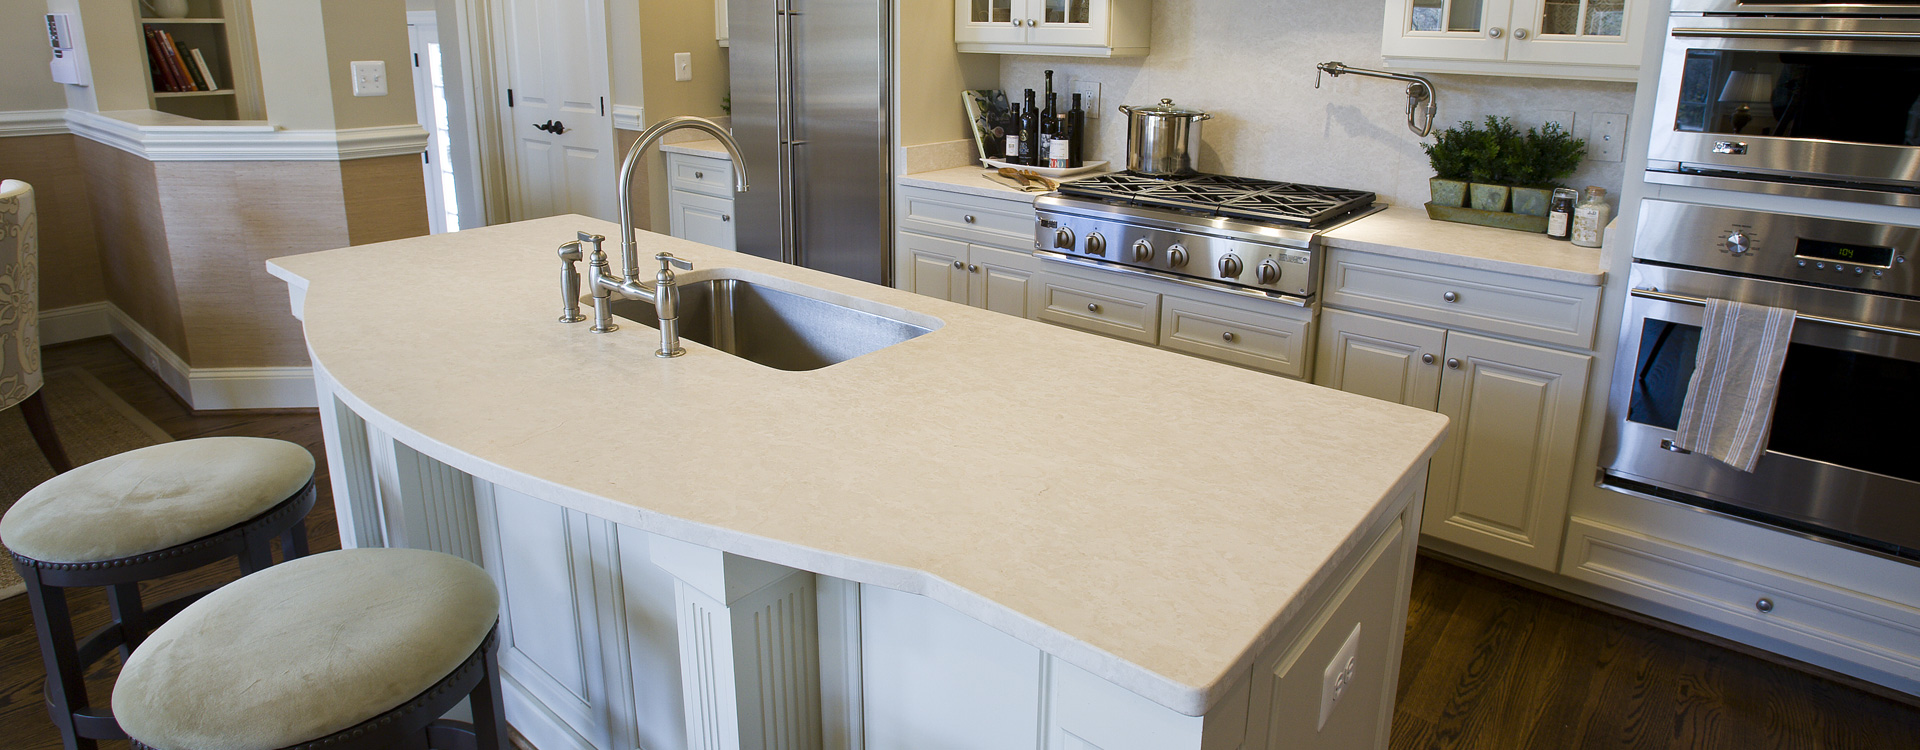 Engineered Quartz Countertops